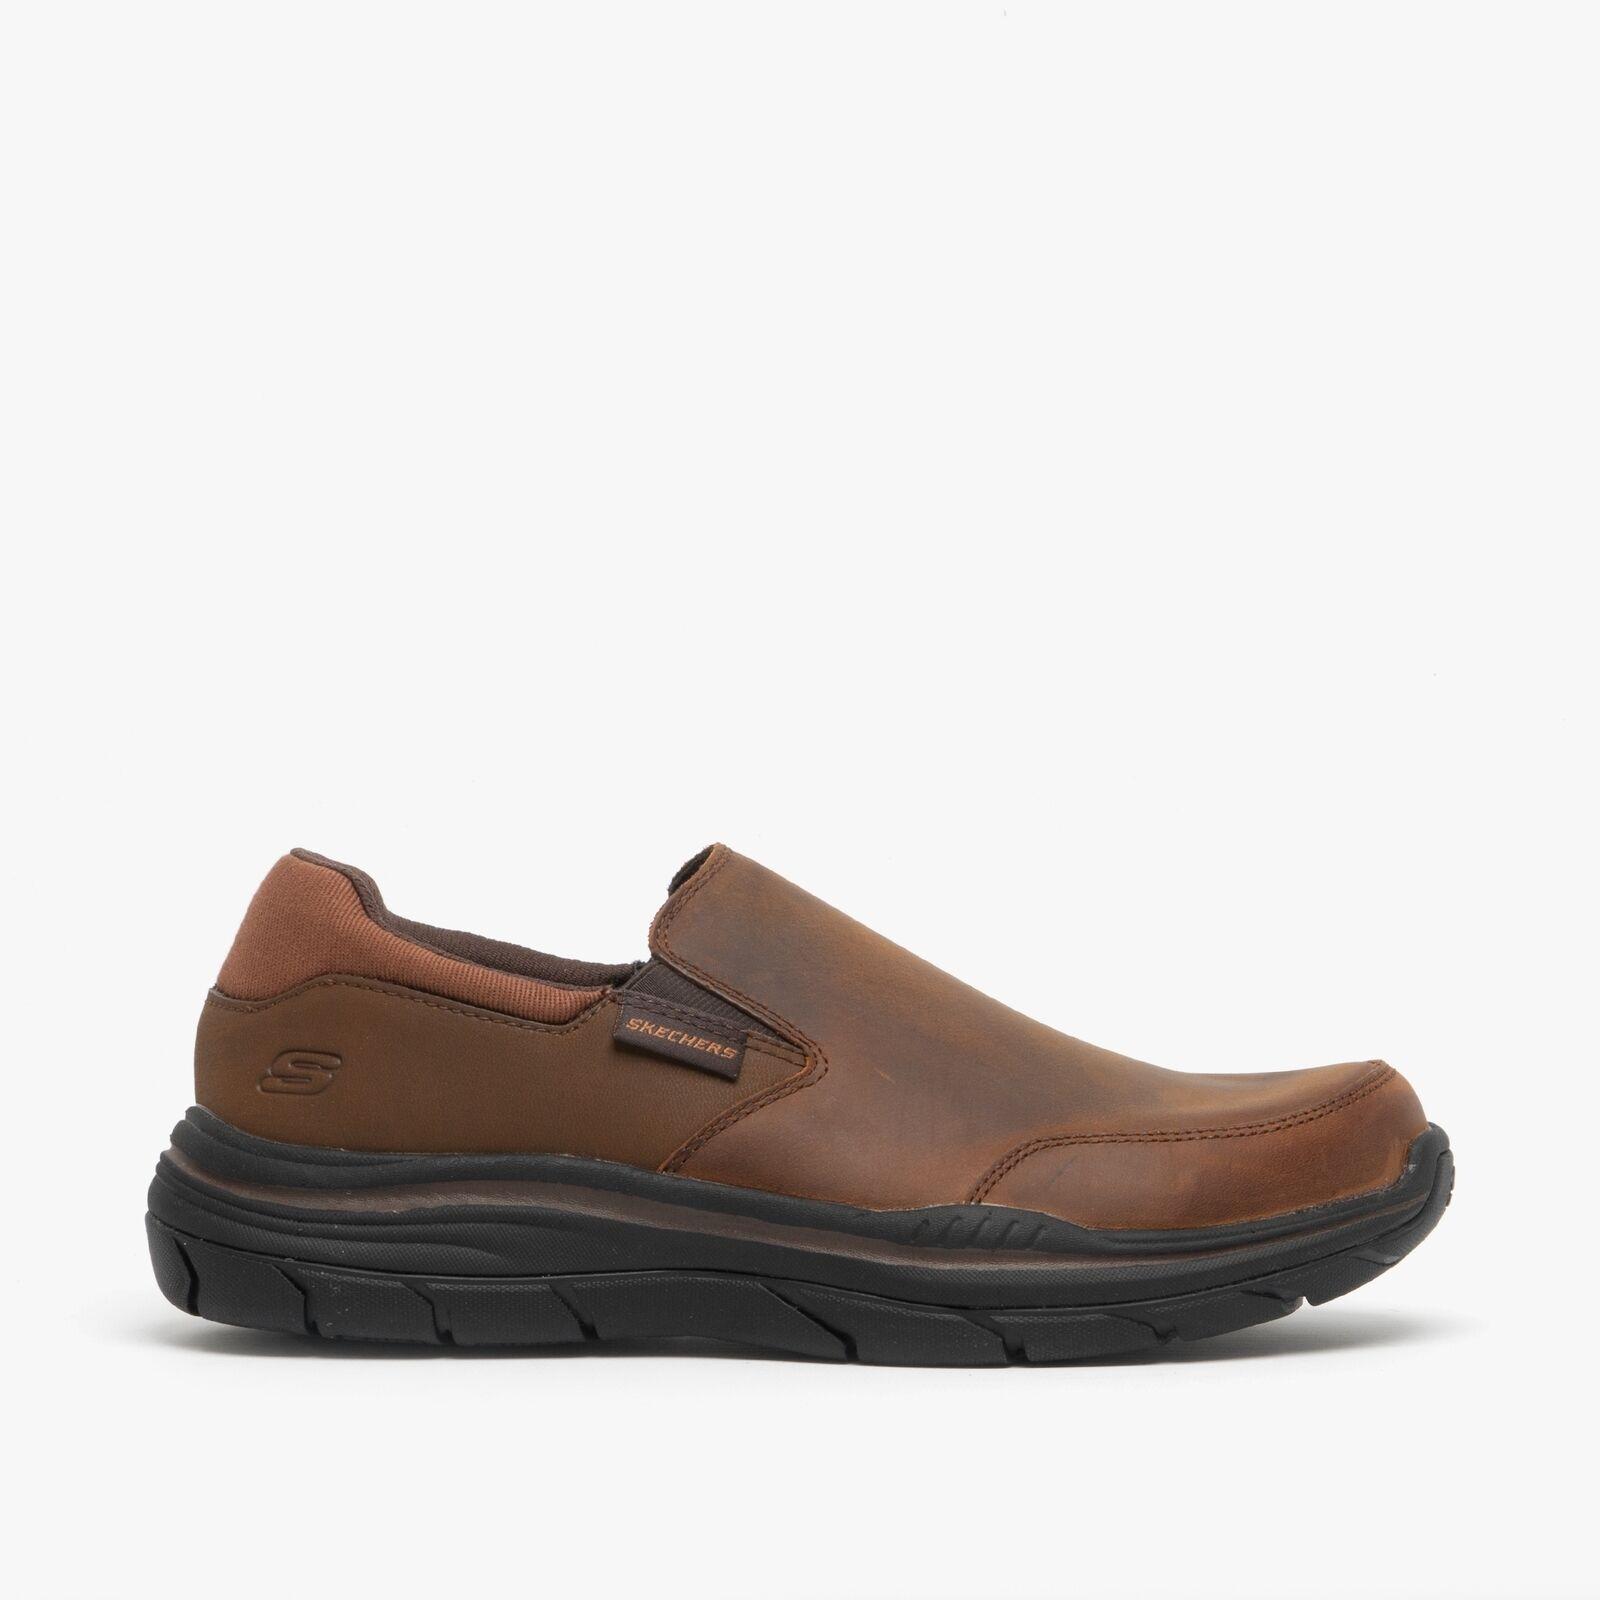 Herrenschuhe Business Schuhe Halbschuhe Loafers Mokassin Freizeit Slipper 42-46